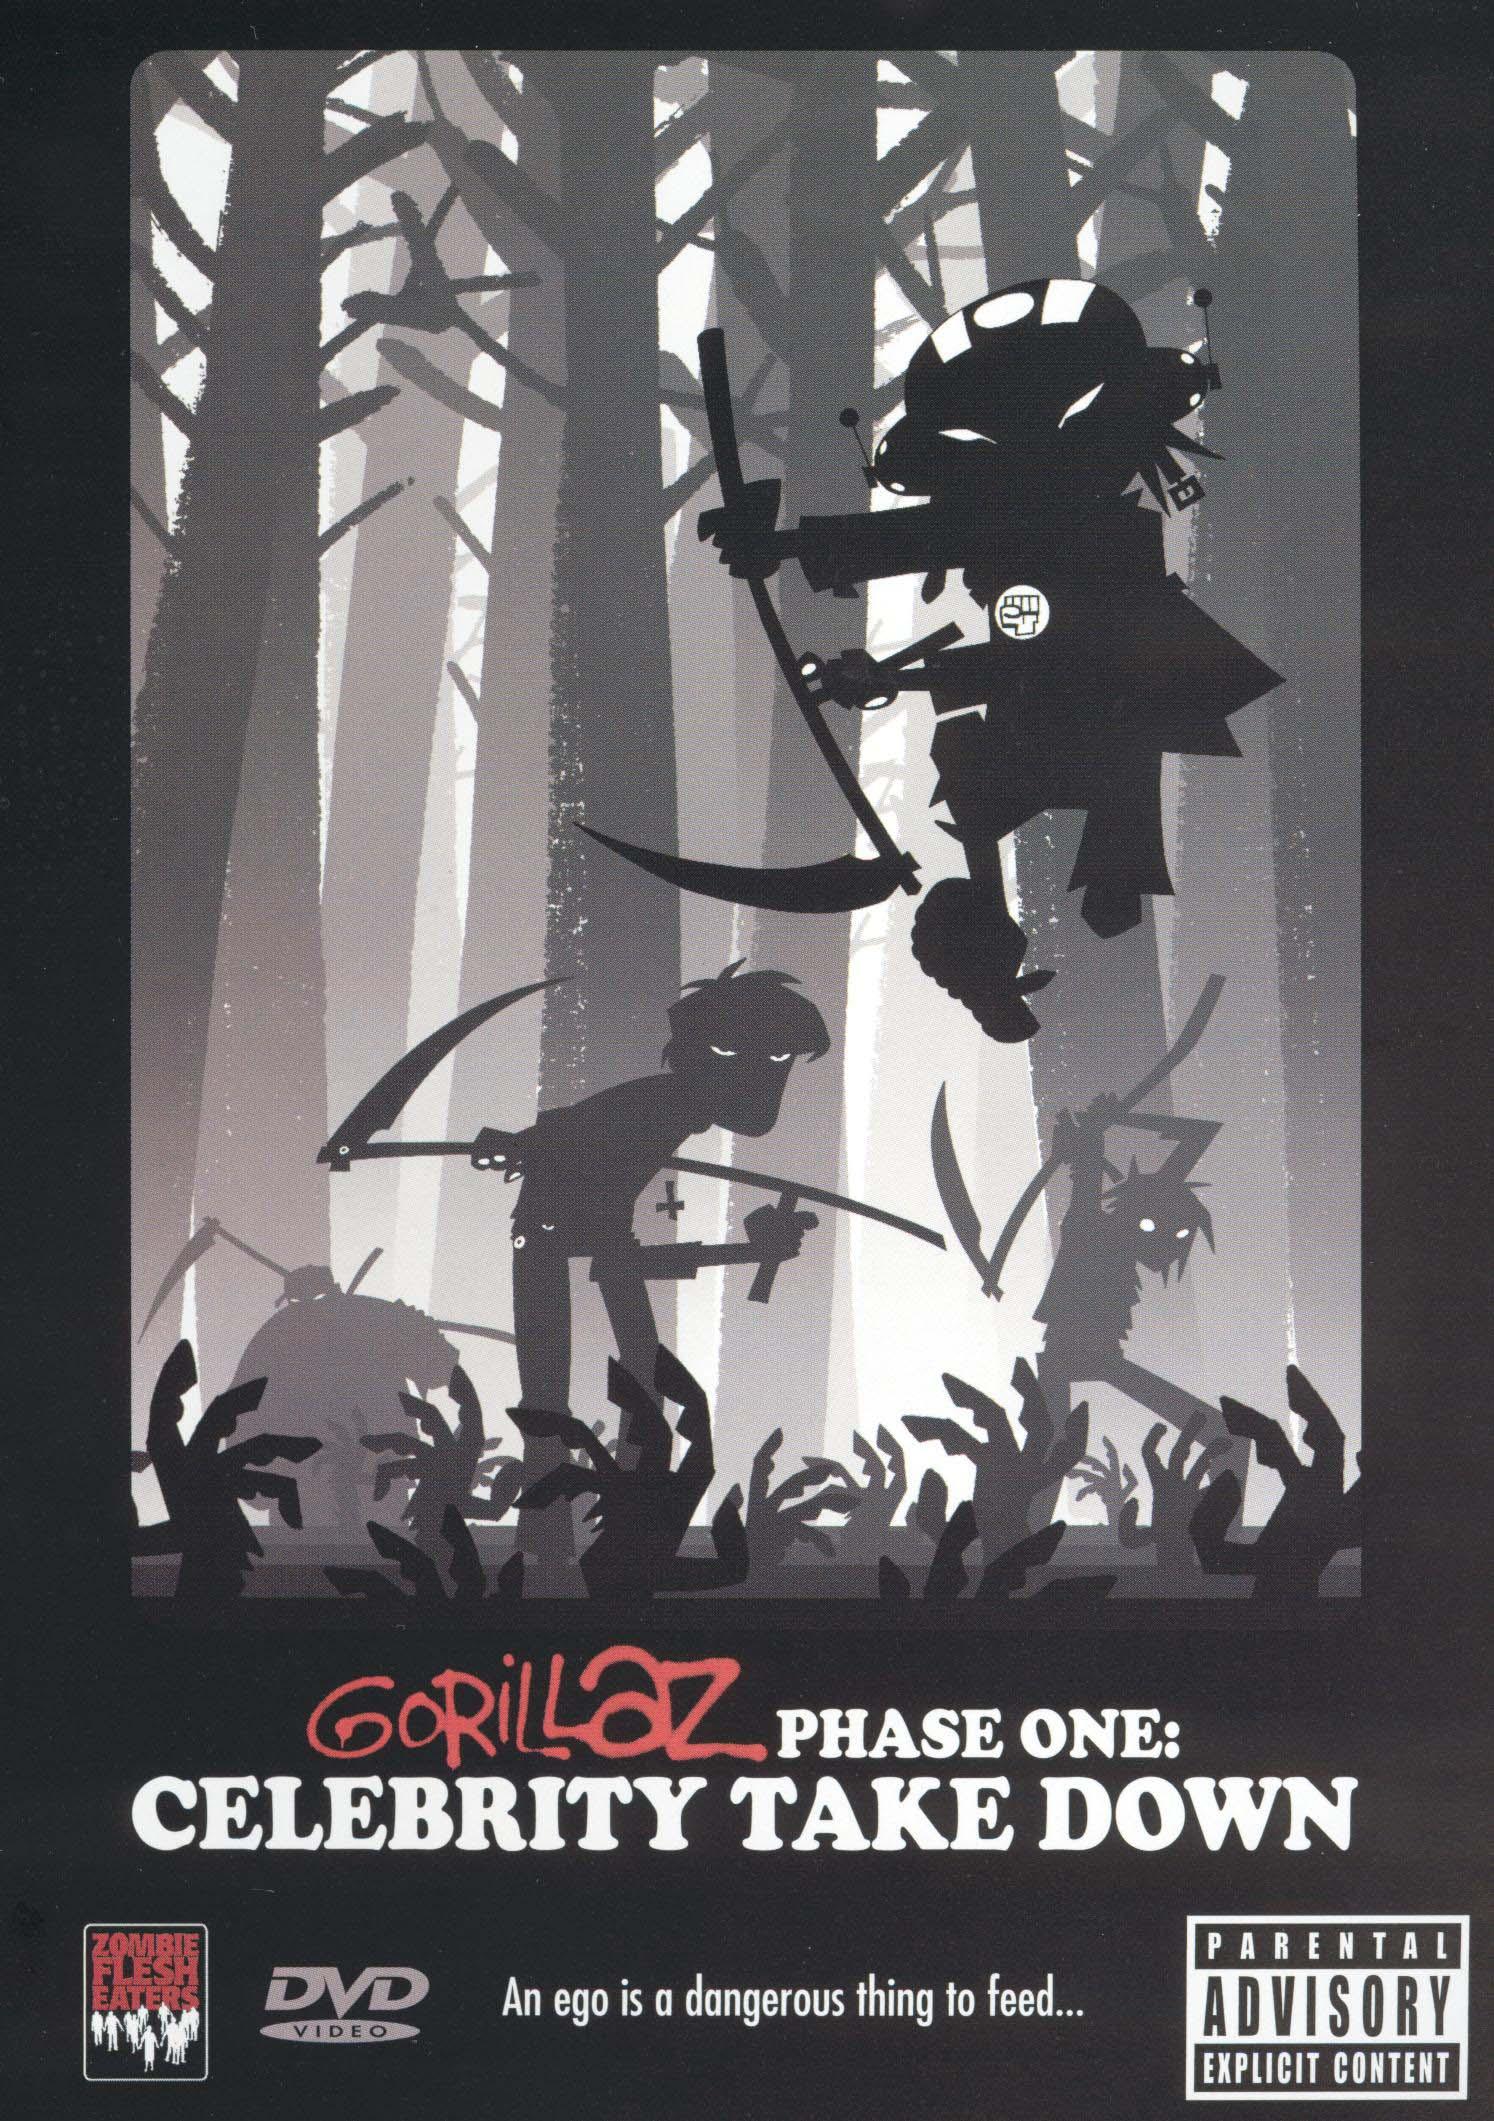 Gorillaz: Phase One - Celebrity Take Down